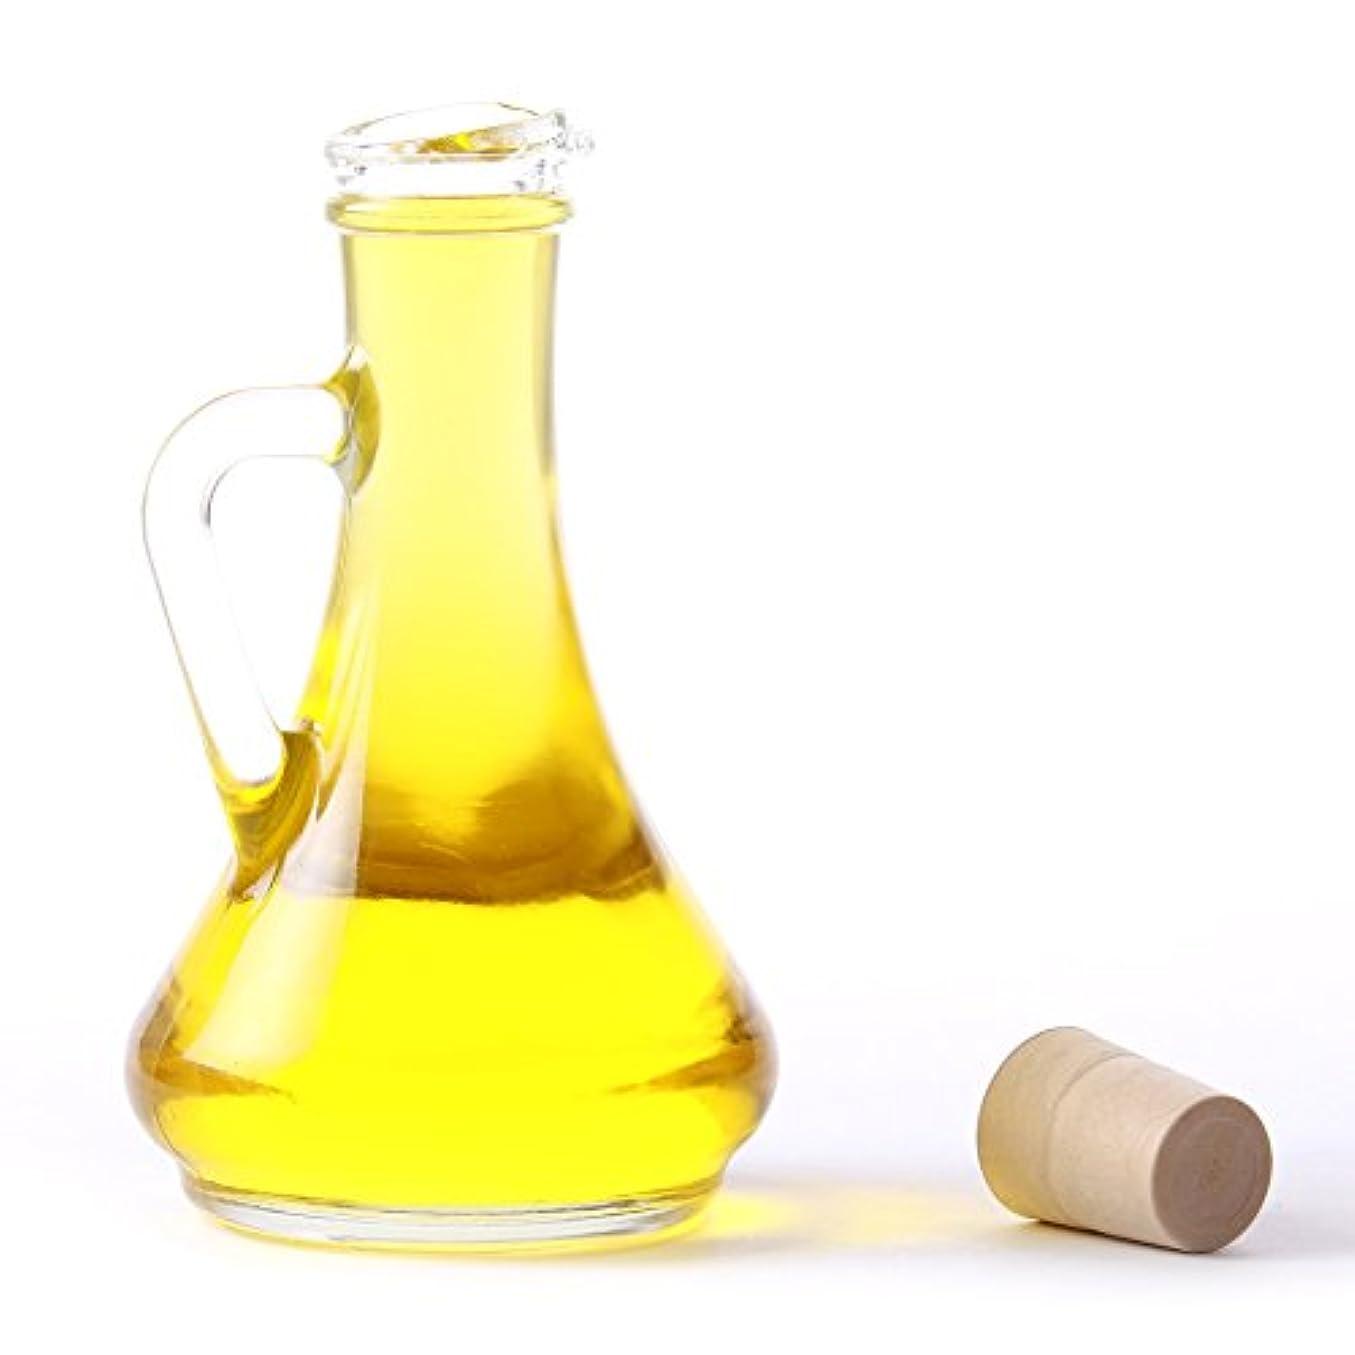 州経度五十Mystic Moments | Evening Primrose Virgin Organic Carrier Oil - 5 Litre - 100% Pure